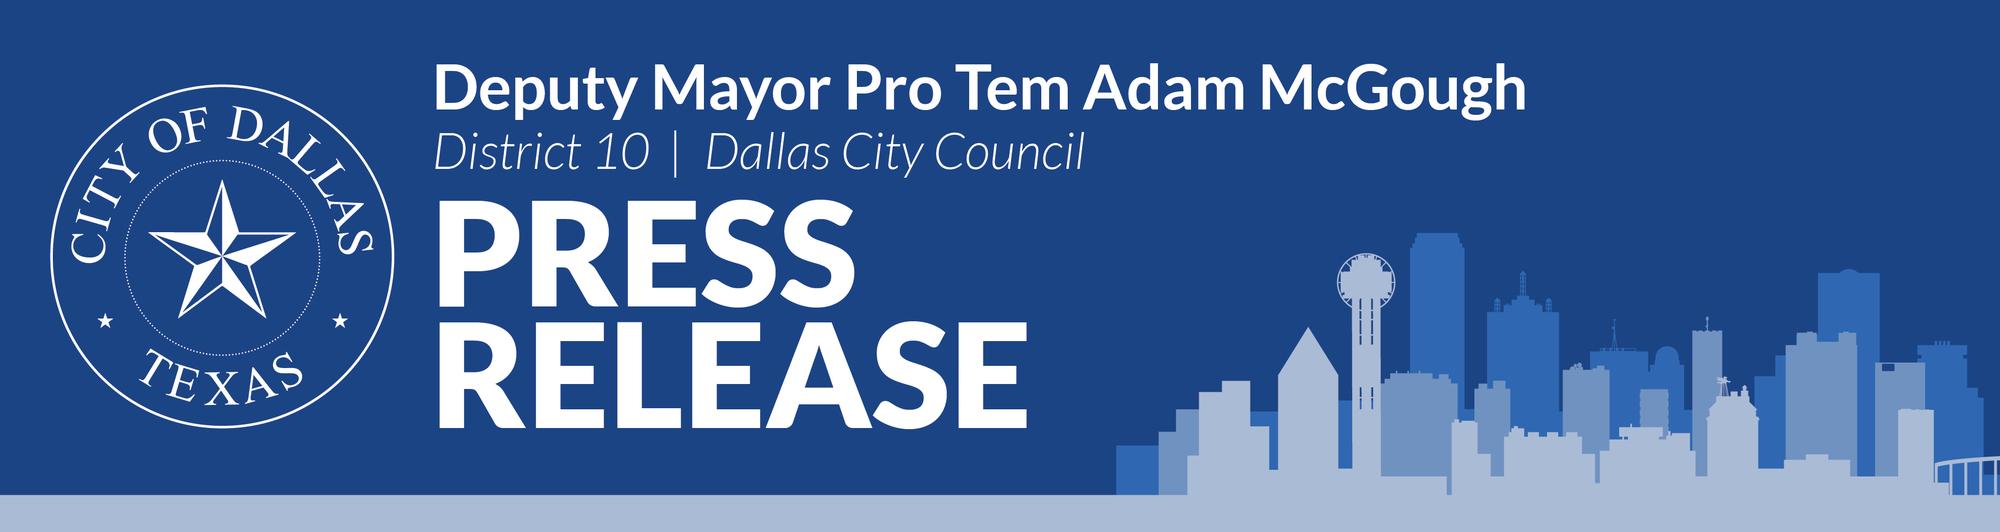 District 10 Press Release Header